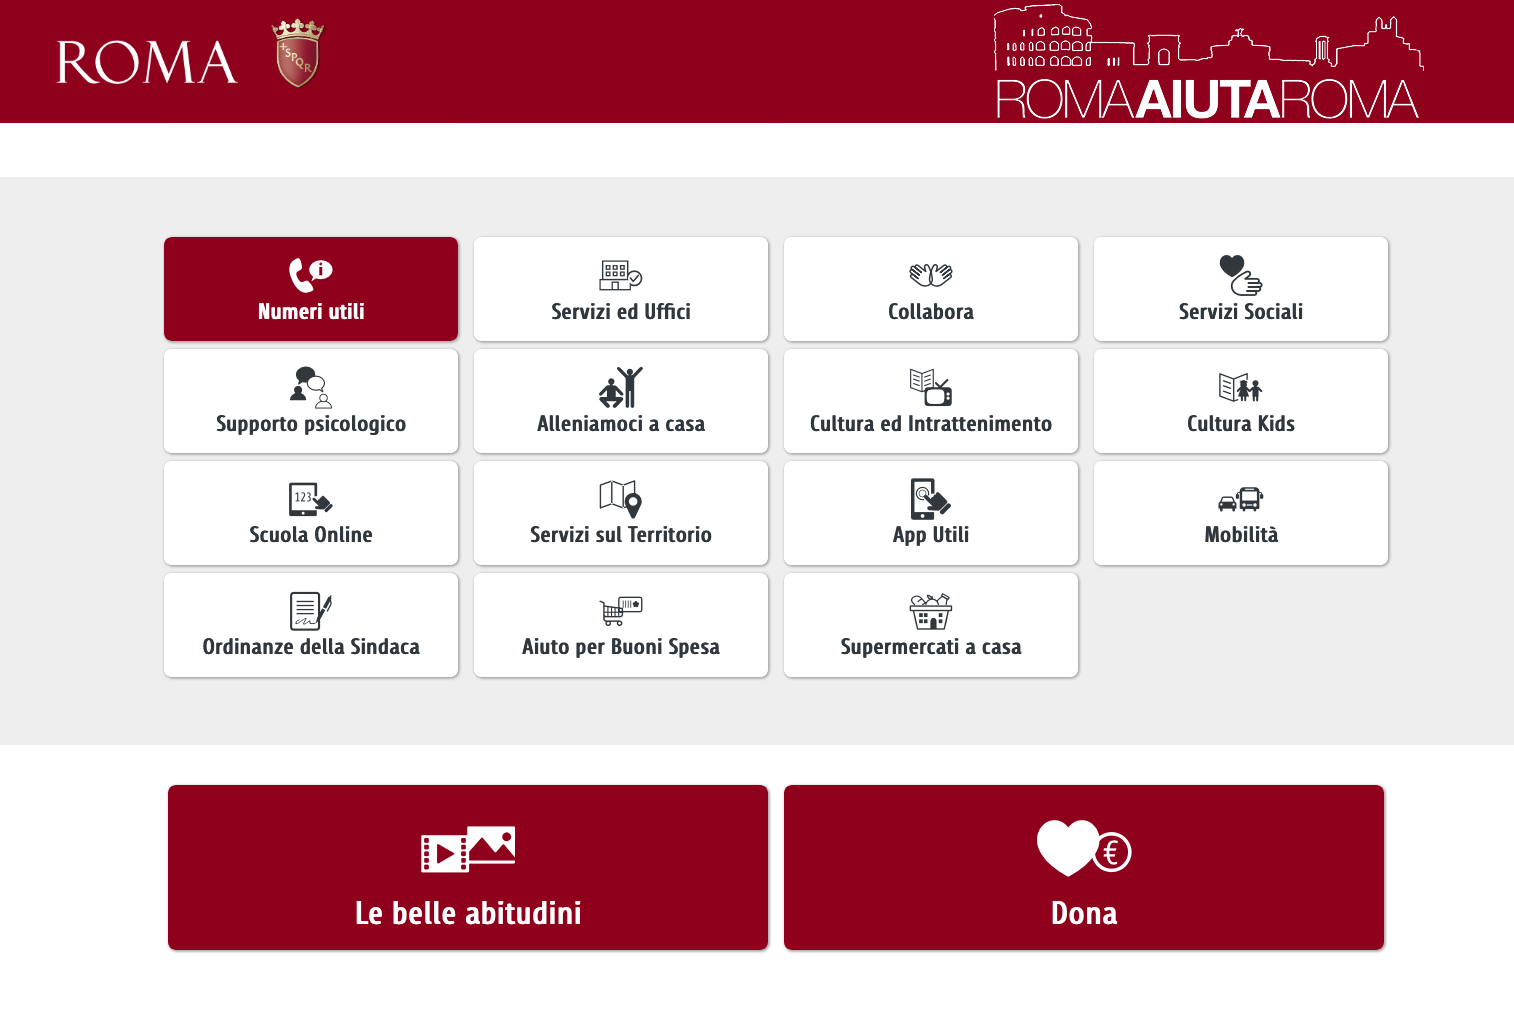 COMUNE ROMA AIUTA ROMASchermata 2020-04-03 alle 17.32.48